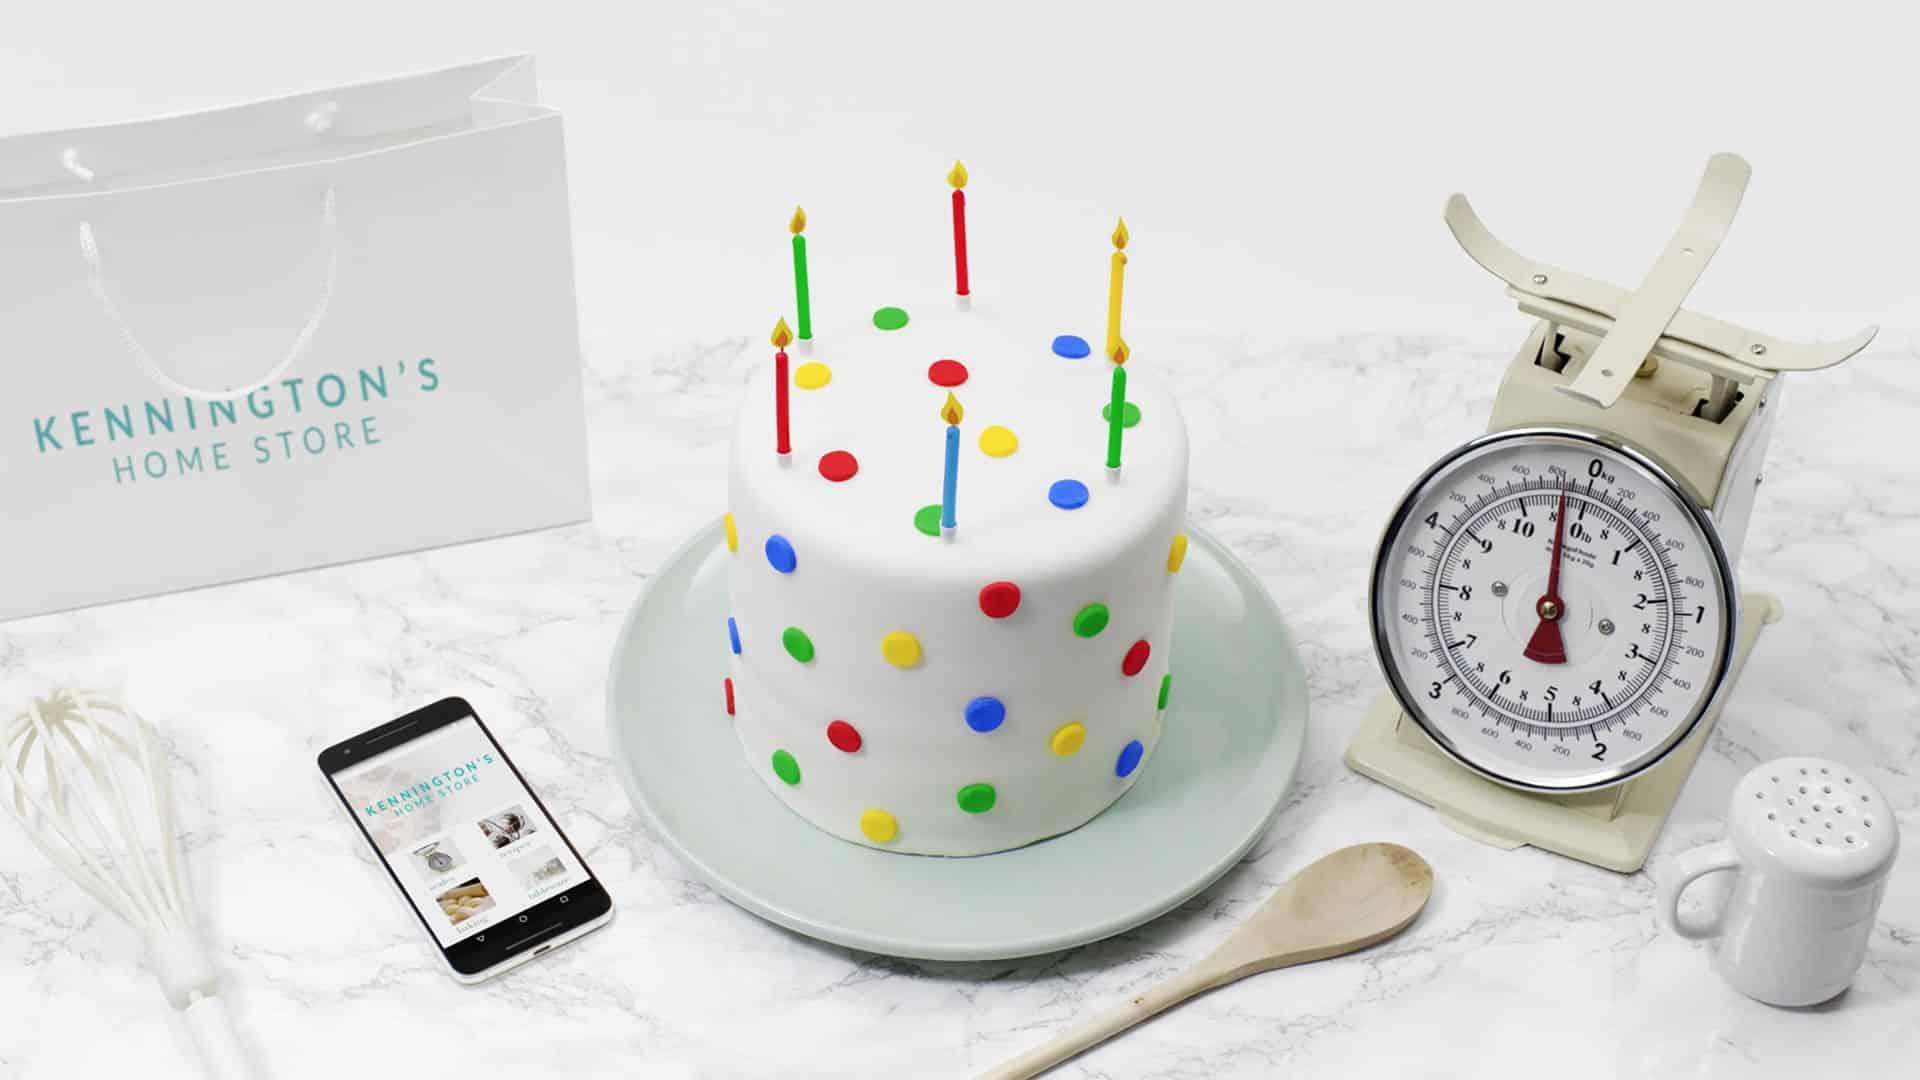 Google Magic cake scene